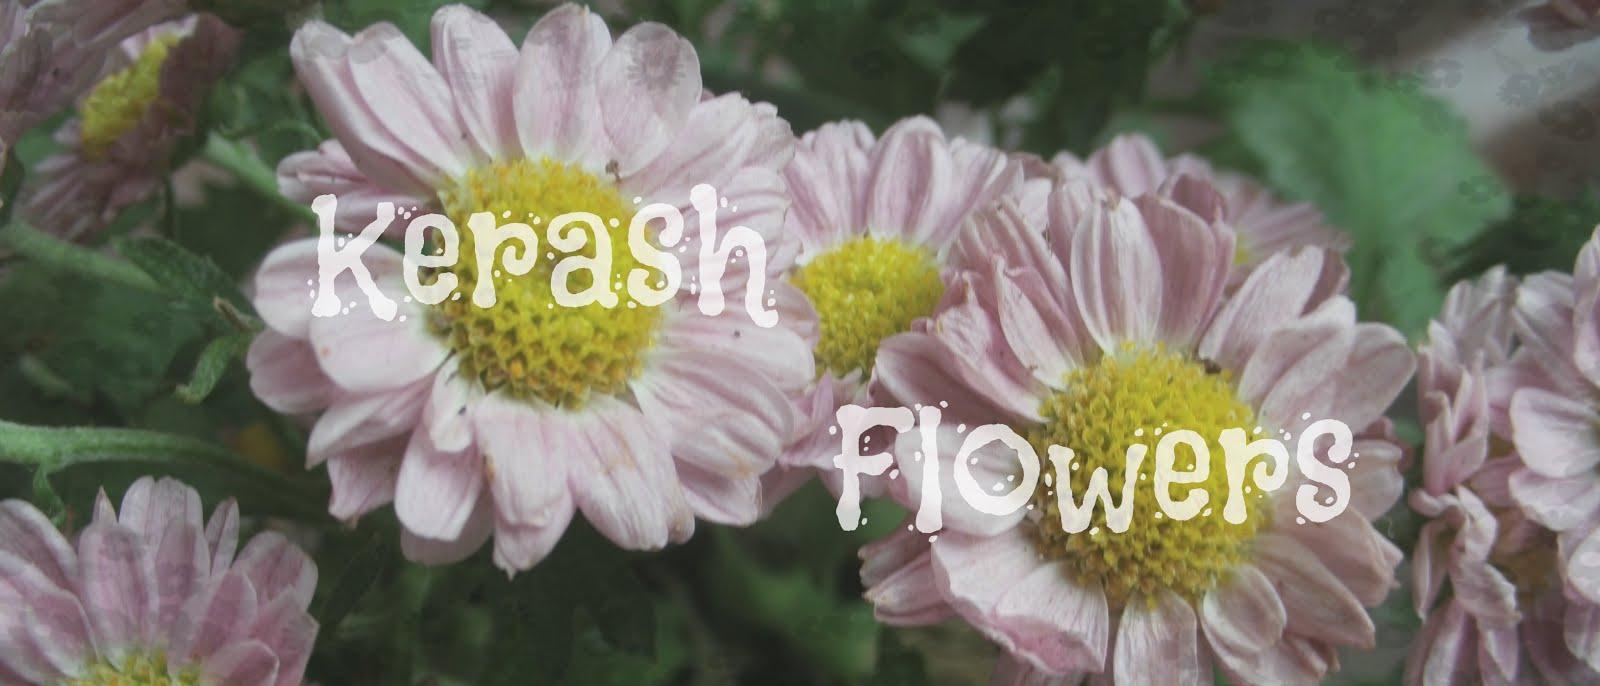 Kerash Flowers